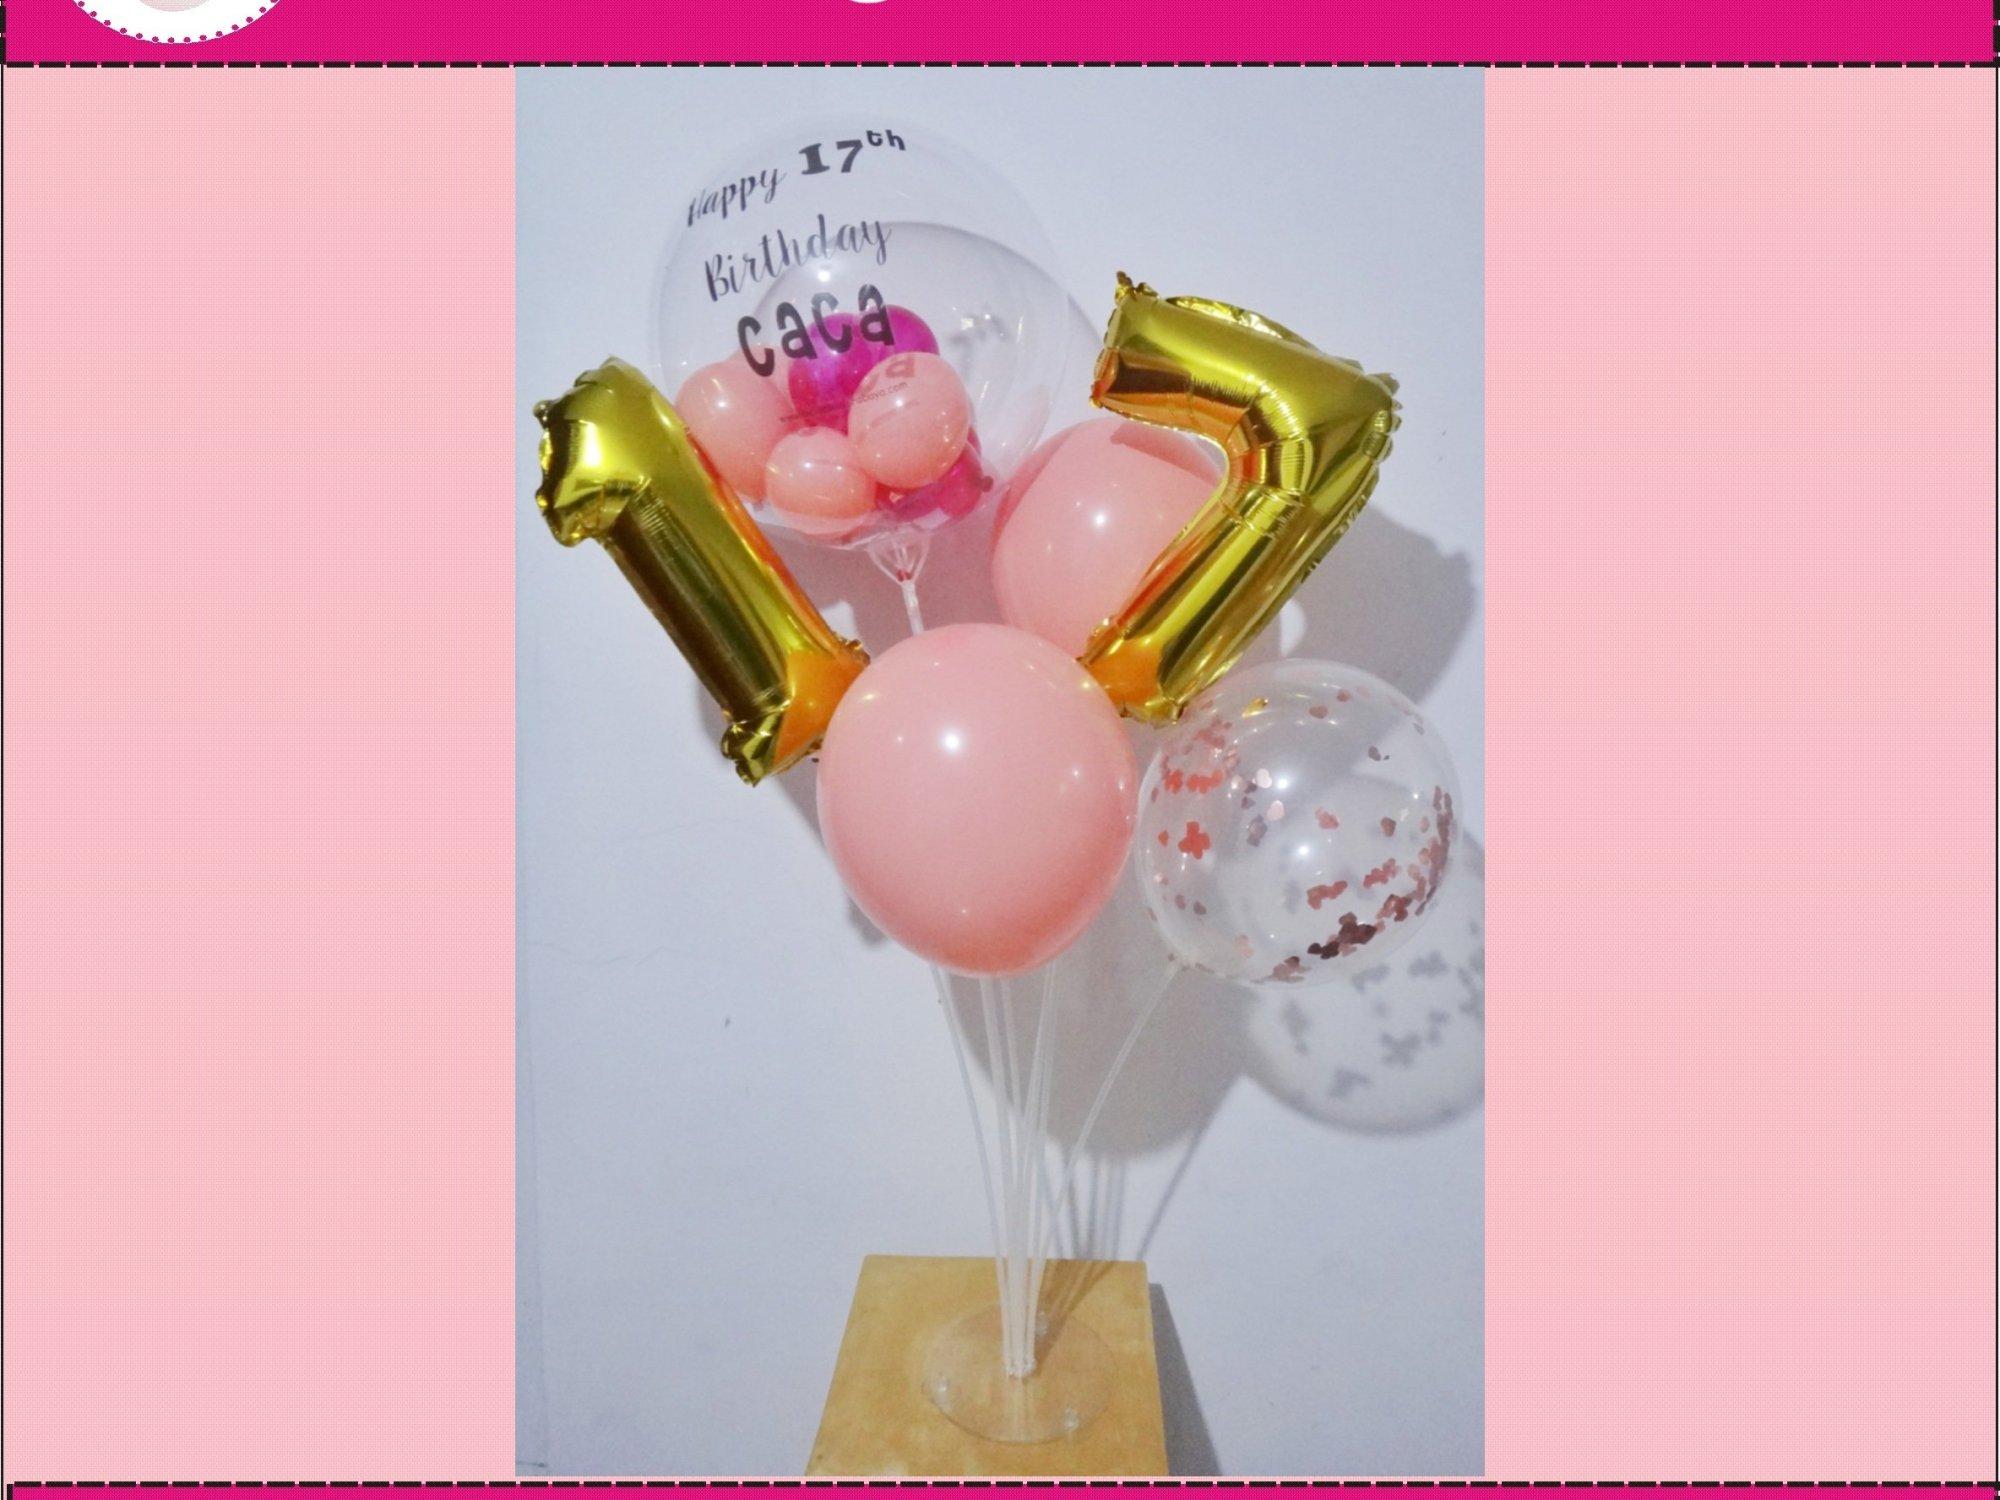 standing balon custom, balon ucapan ulang tahun anak, balon ucapan ulang tahun warna merah, balon ucapan ulang tahun merah, balon ucapan ulang tahun anak balon ucapan warna peach, baln ucapan box coklat, jual balon latex twist hijau emerald, BAlon Gas,Bunga dekorasi,Rangkaian bunga artificial, Buket bunga, buket bunga mawar, harga buket bunga,Balon sablon, balon Printing, balon promosi, Perlengkapan ulang tahun, Balon latex , balon doff, balon natal, balon agustusan, balon dekorasi, balonku Surabaya, 085733133529